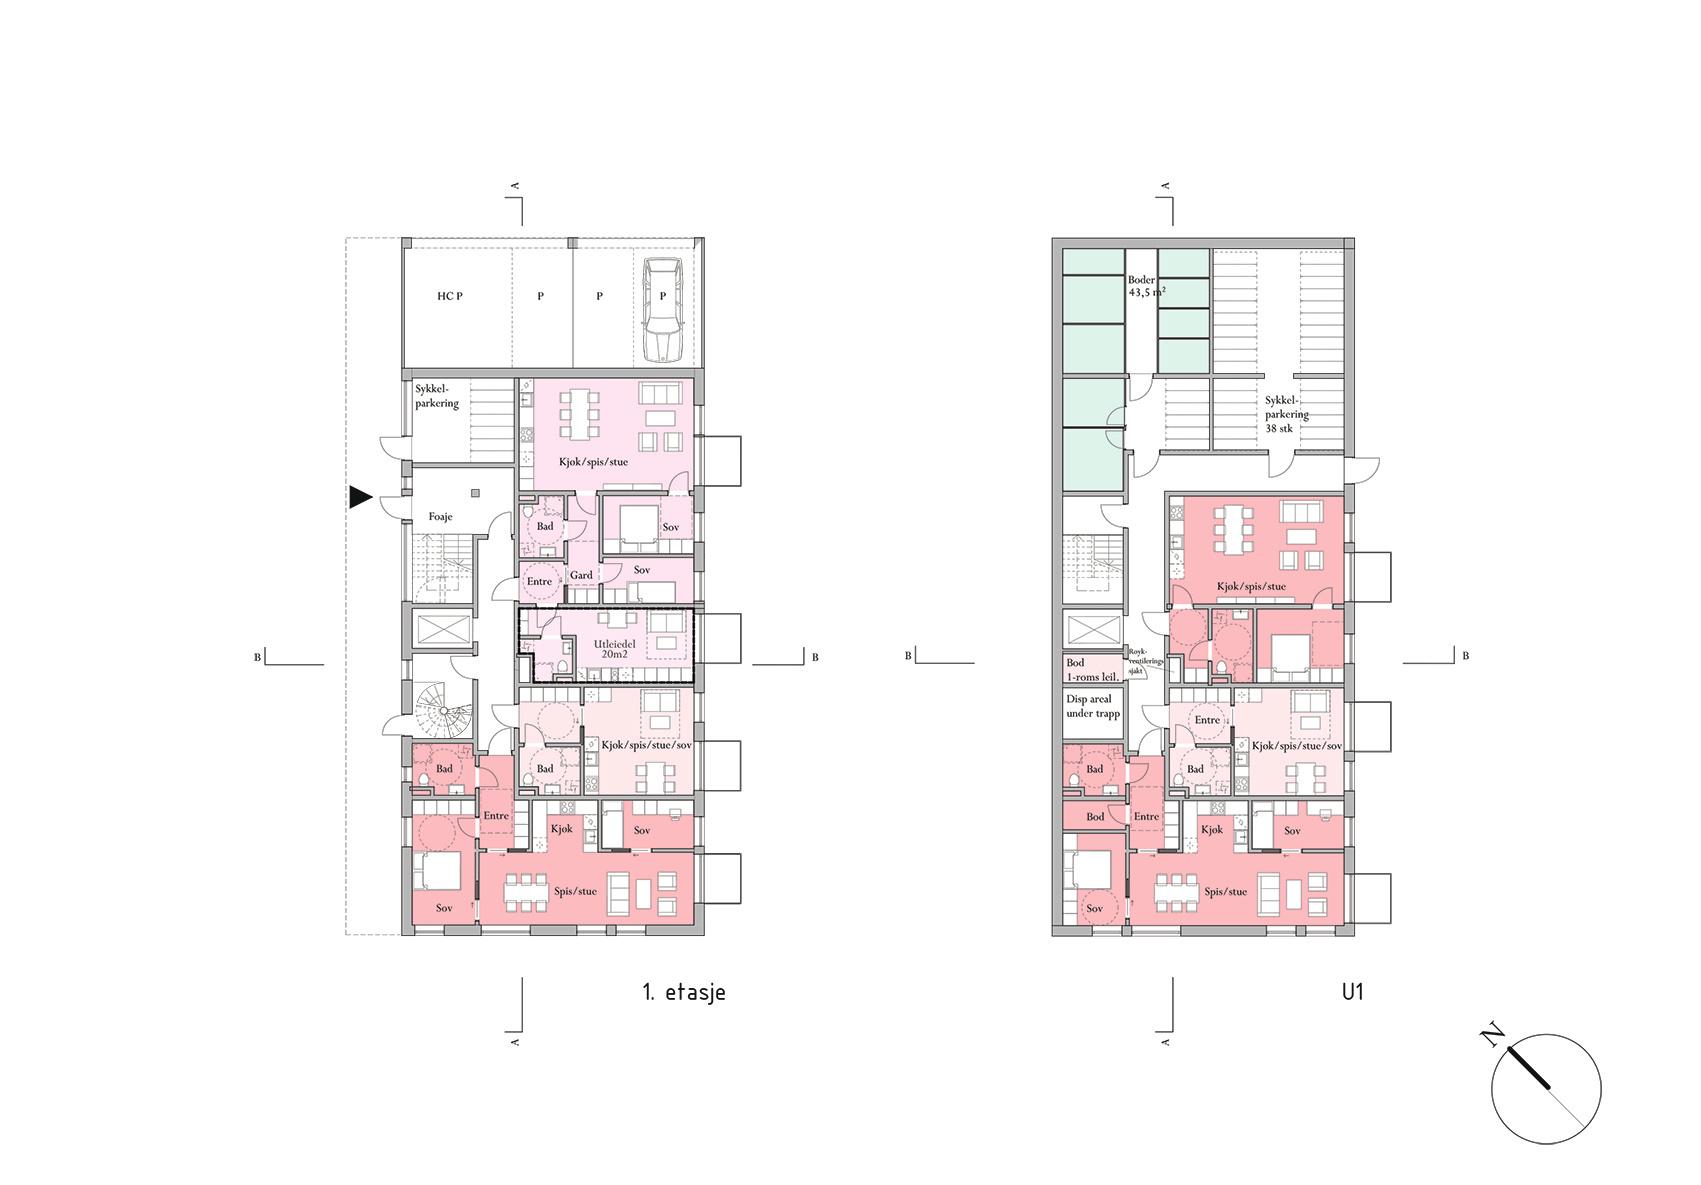 Plan 01 og U1